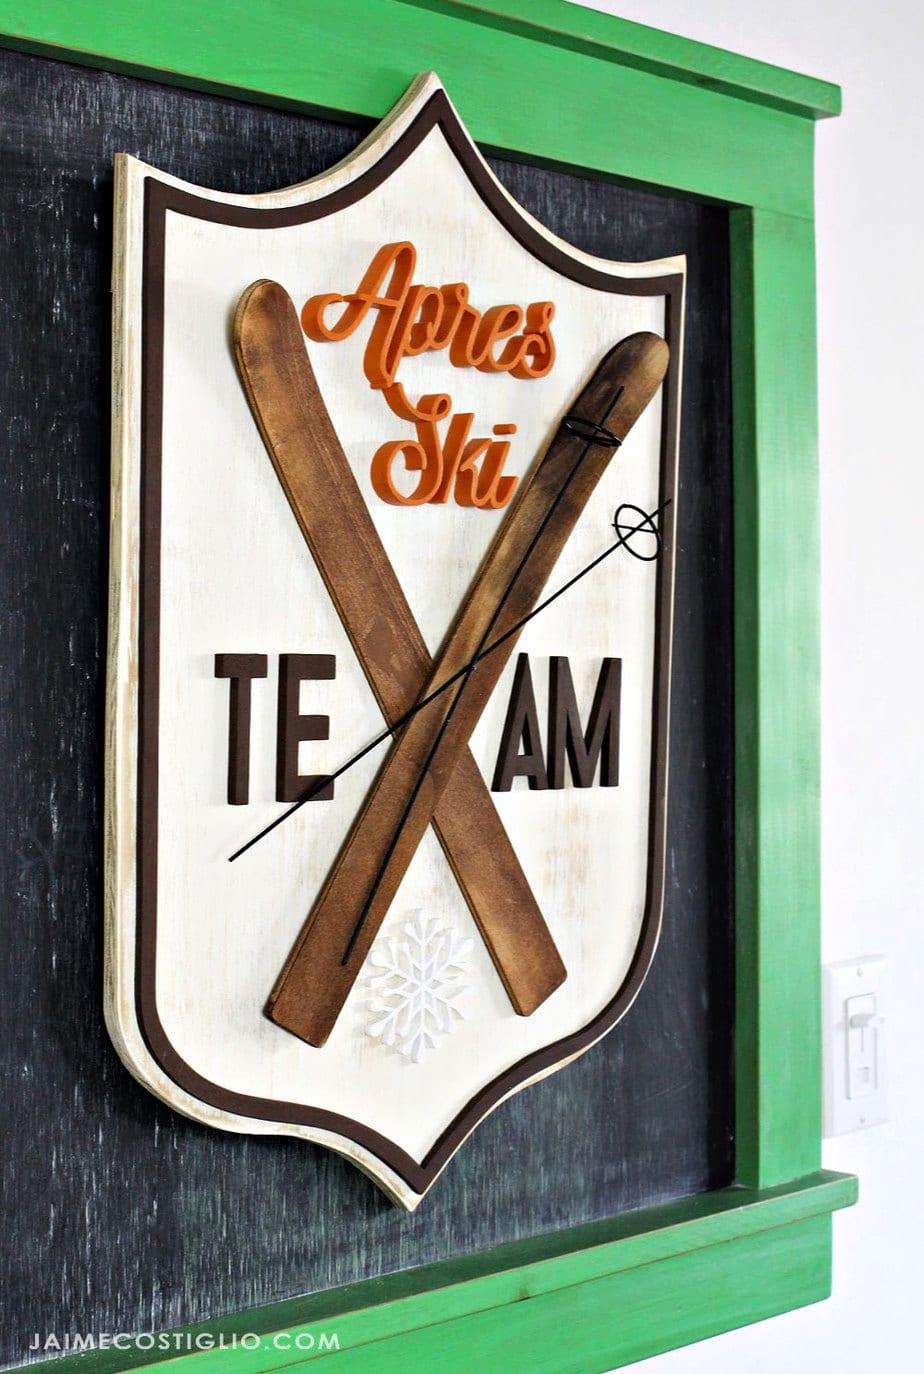 apres ski scrolled wood plaque